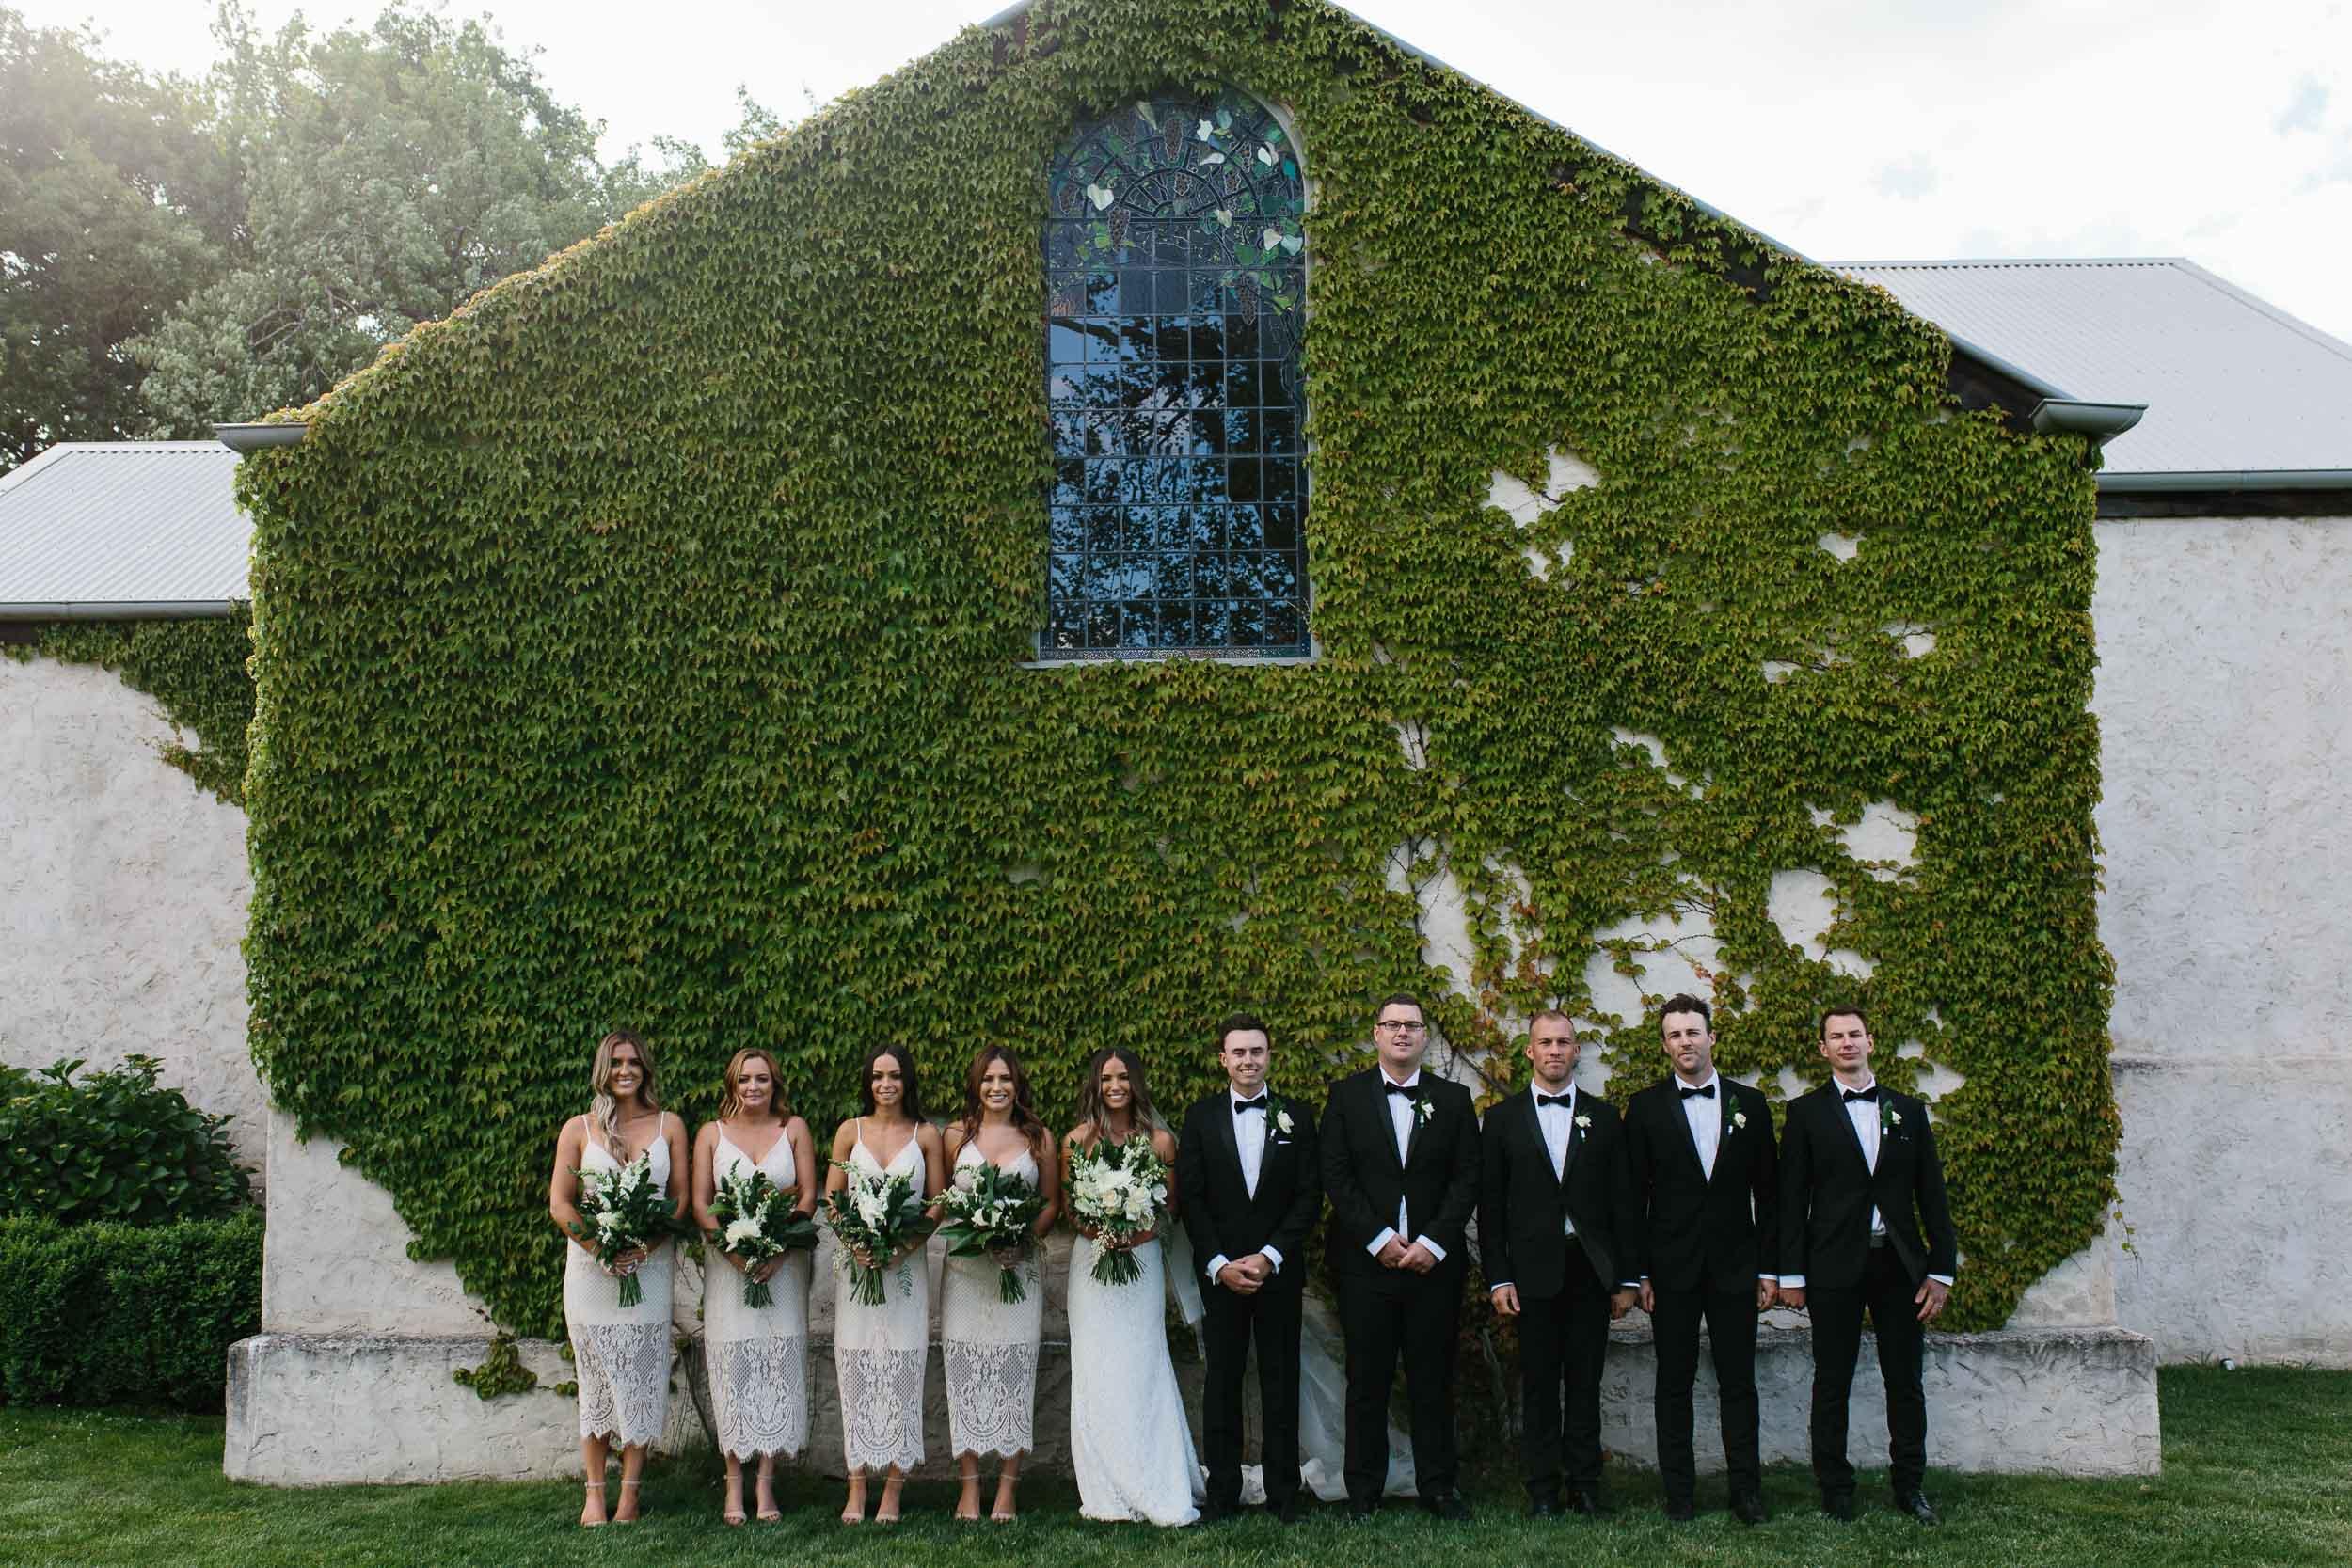 Kas-Richards-Stones-of-the-Yarra-Valley-Wedding-566.jpg